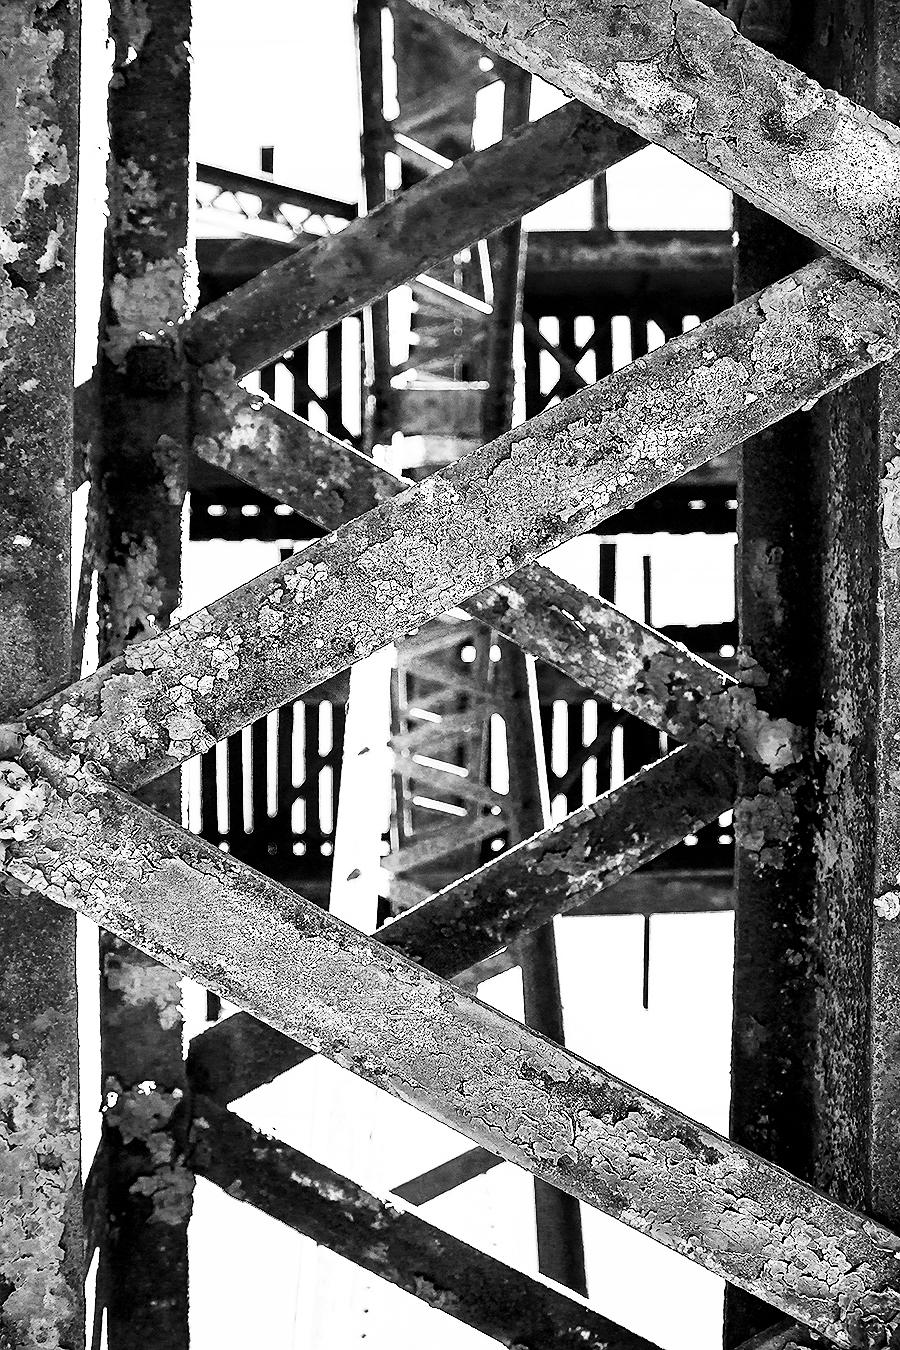 Janelle_Tong_Photography_Tony_Ward_Studio_Individual_Project_UPenn_Penn_Park_Bridges_Railroad_Tracks_Underneath_Rust_Closeup_Perspective_Black_and_White